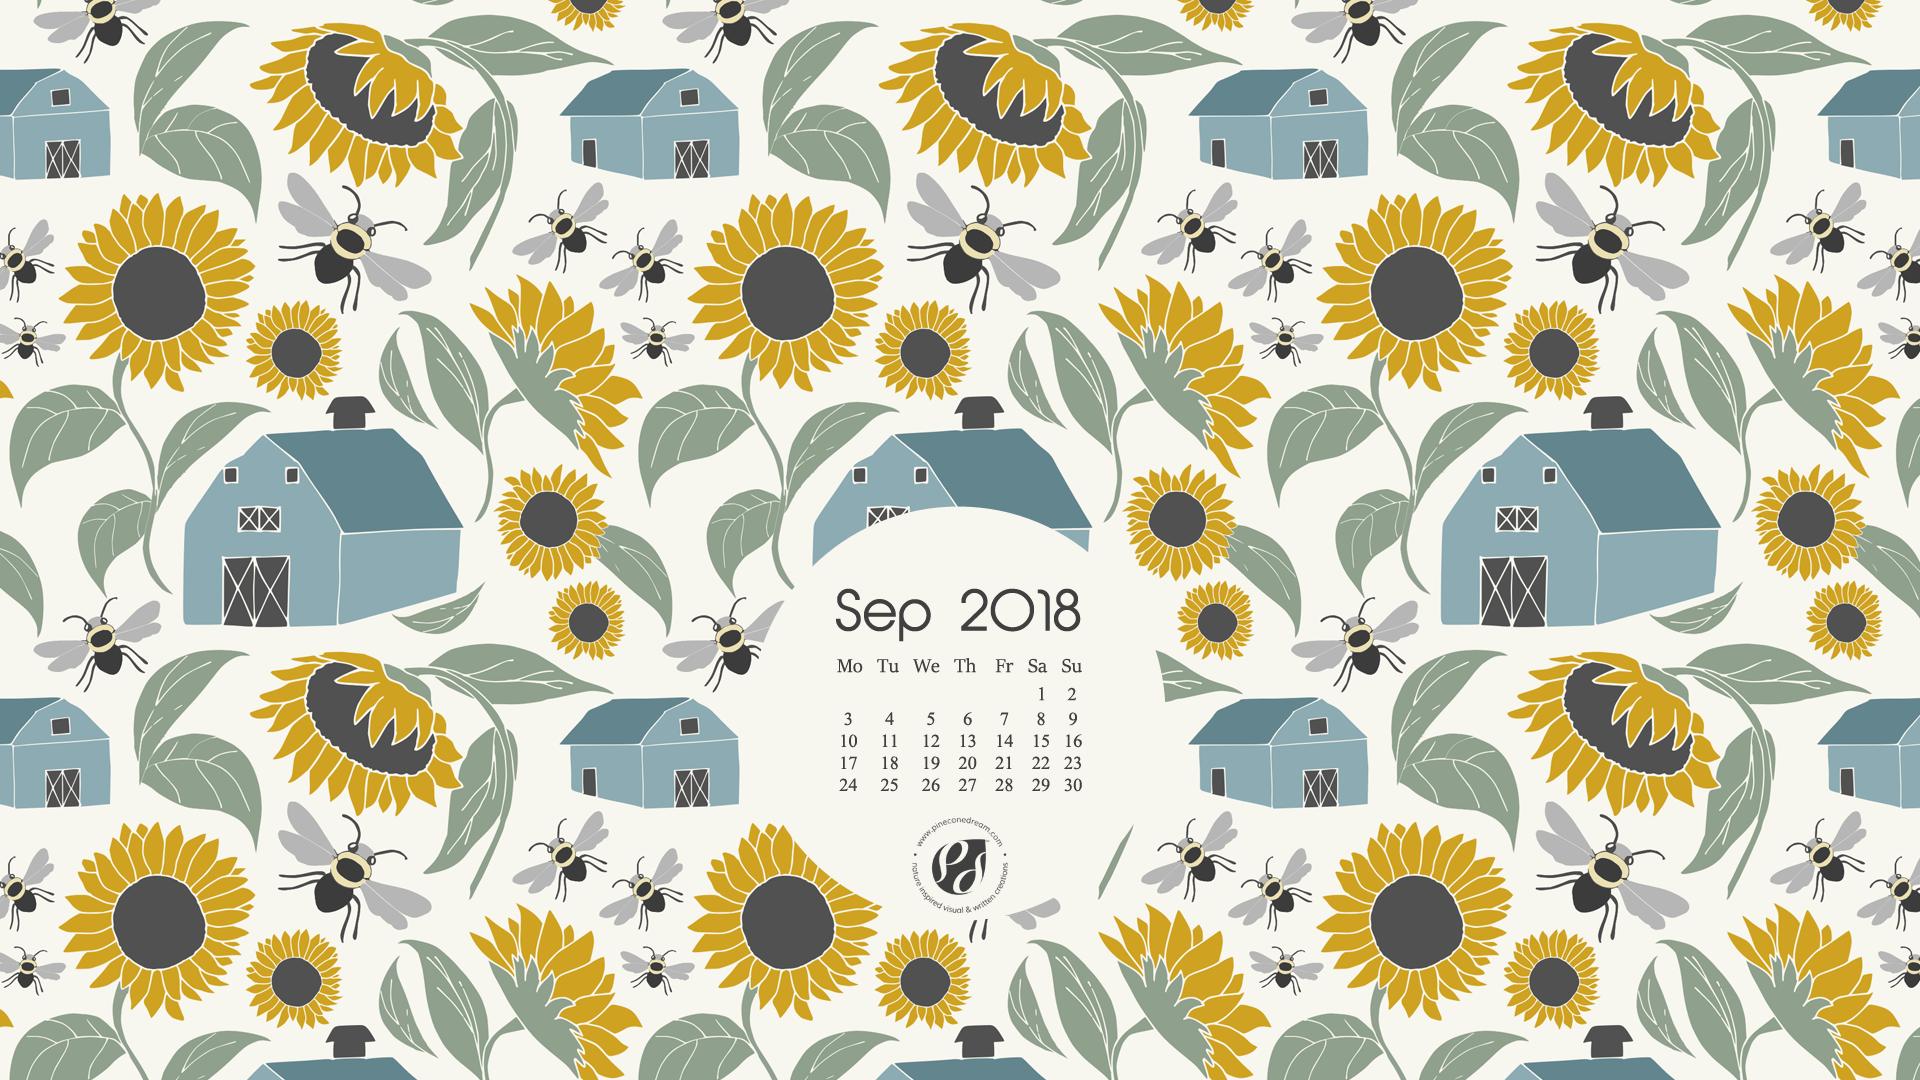 September 2018 Free Wallpapers/Calendars & Printable Planner, illustrated – At Sunflower Farm!